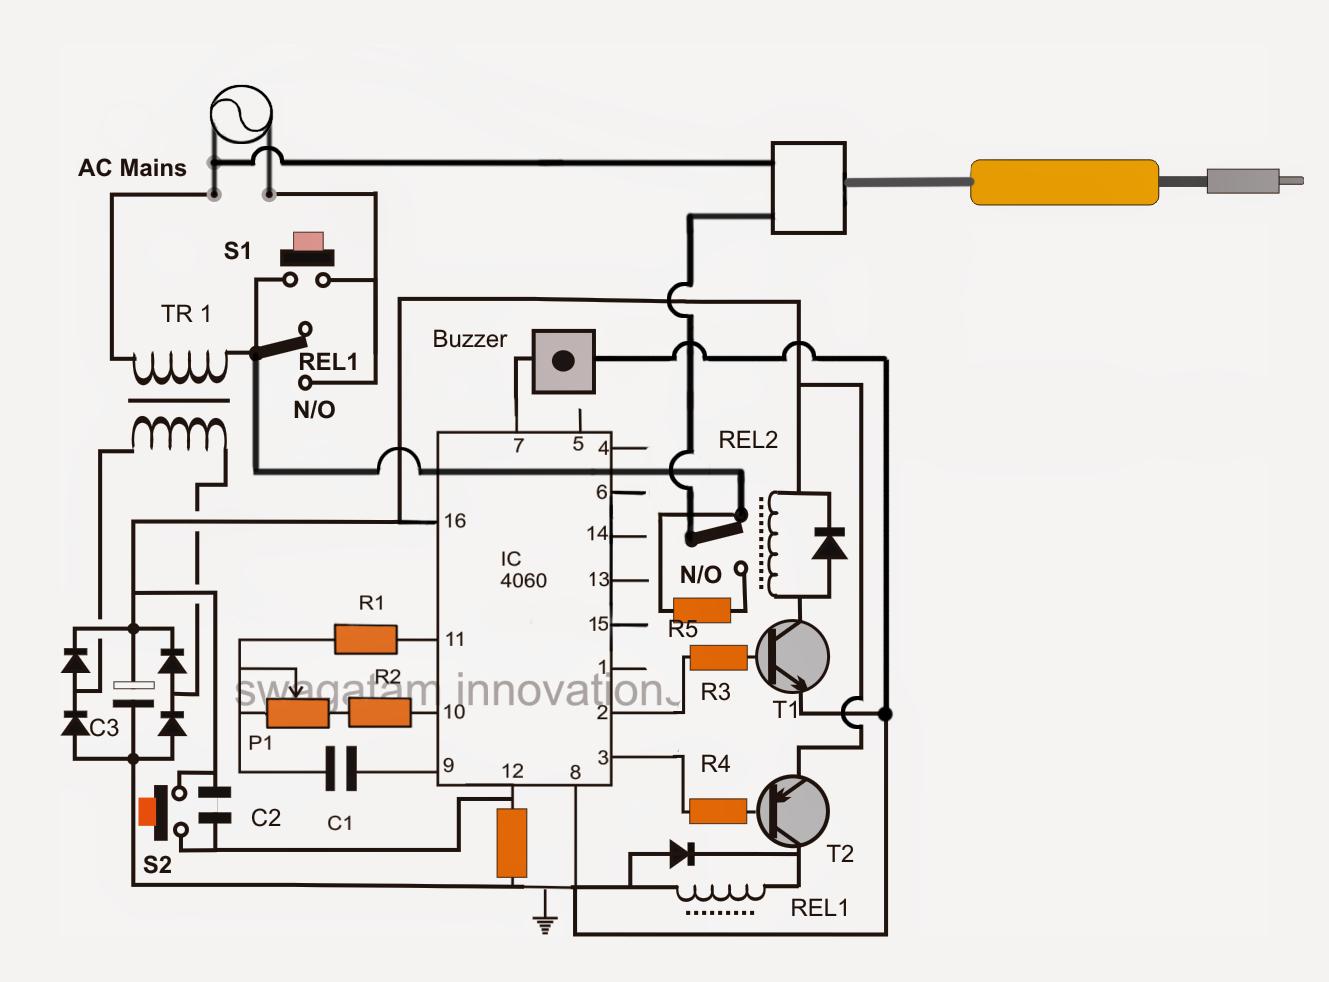 Soldering Iron Wiring Diagram 30 Kva Transformer Automatic Power Shut Off Circuit